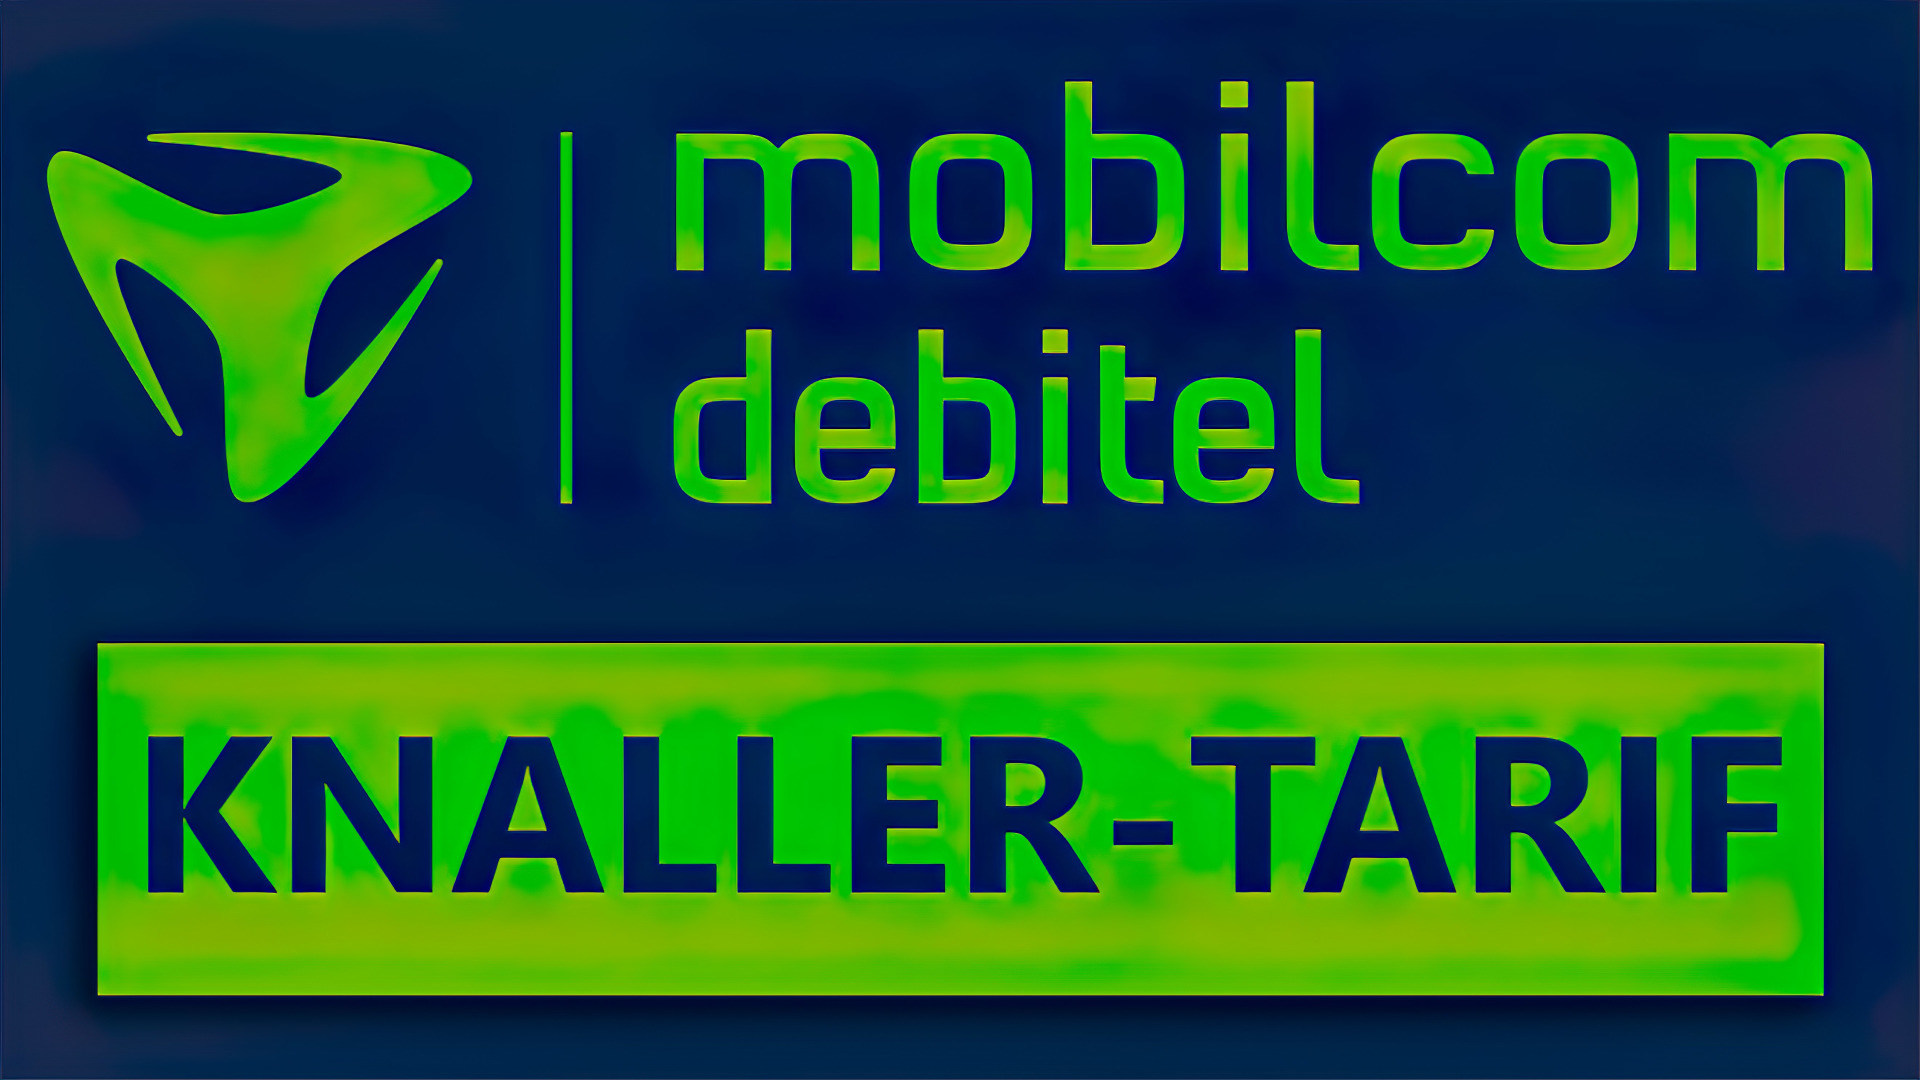 Mobilfunk, Schnäppchen, Sonderangebote, Rabattaktion, Telekom, Tarif, Mobilcom-Debitel, Mobilcom Debitel, Knaller